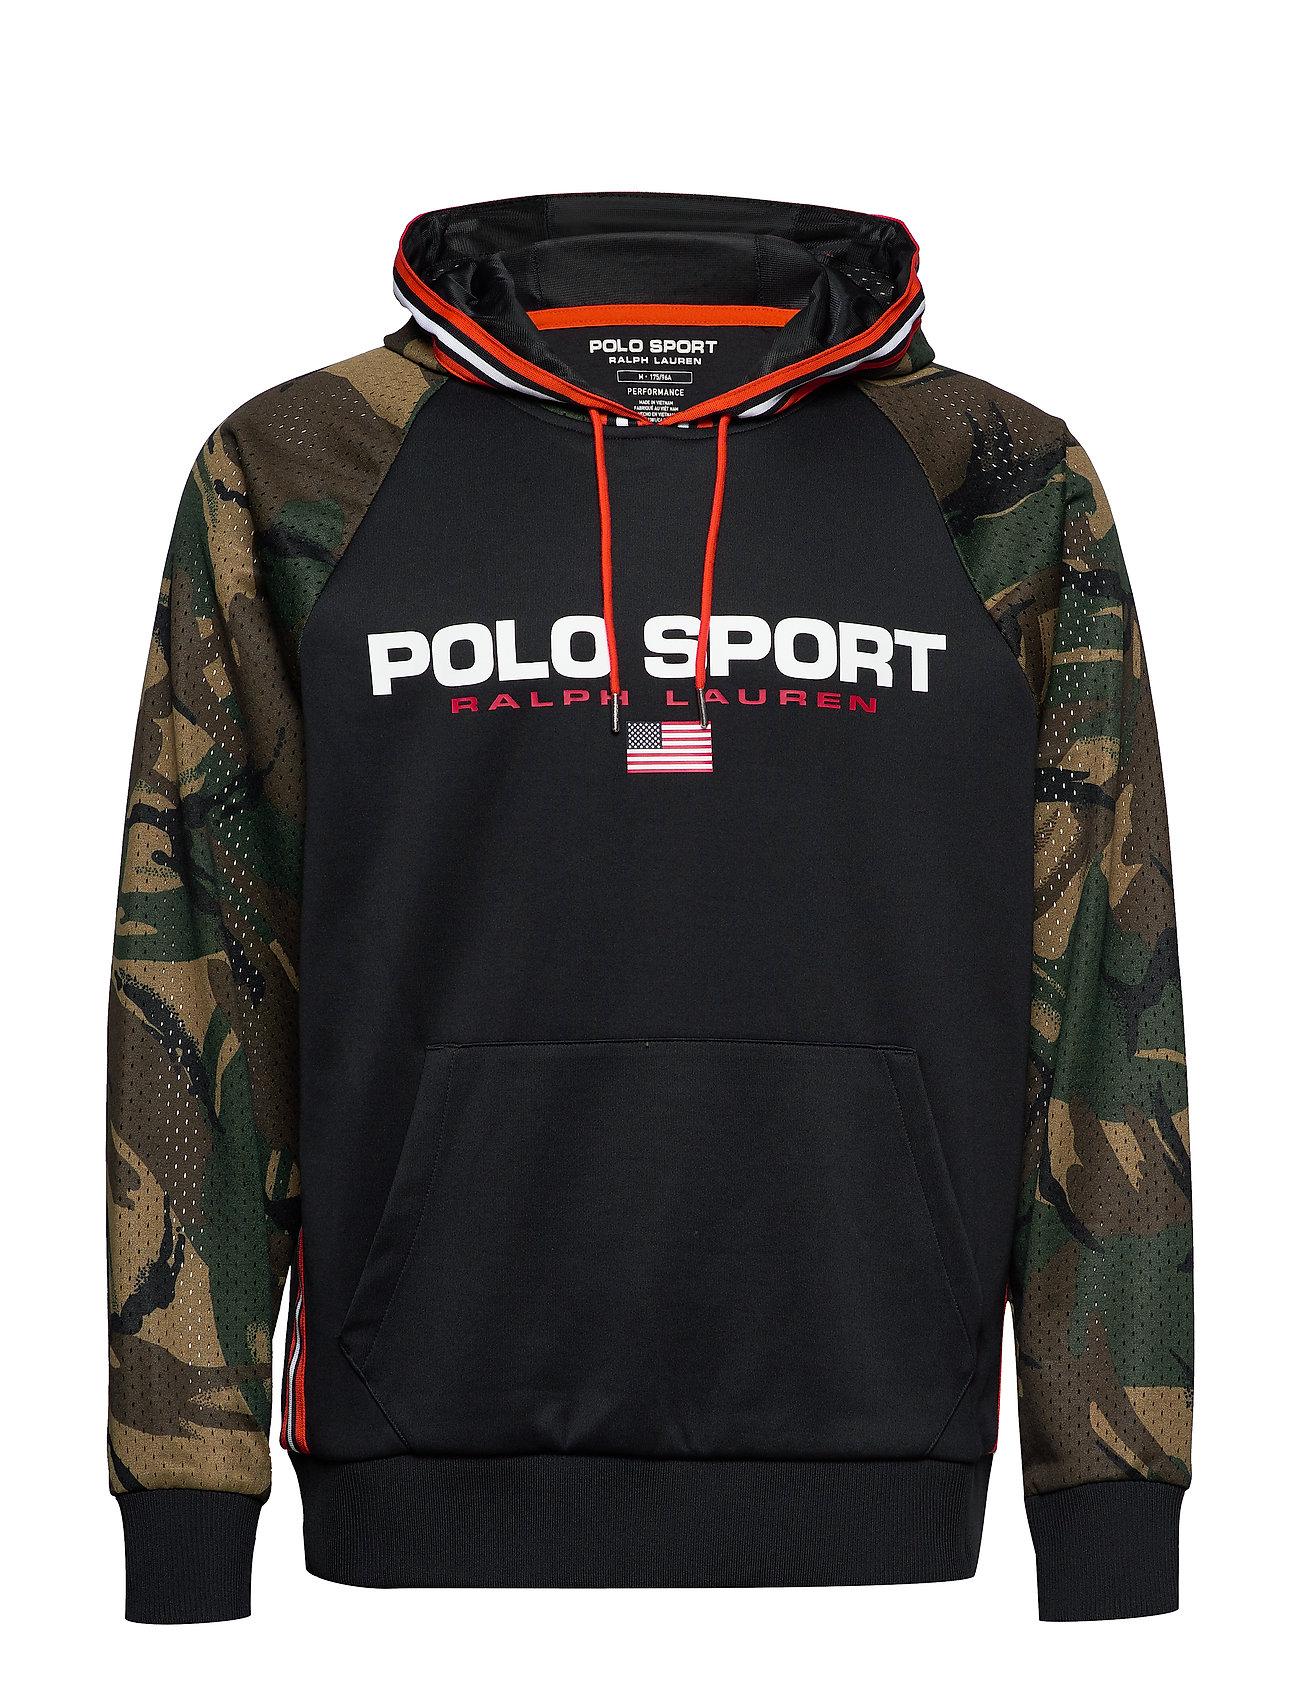 Polo Ralph Lauren Polo Sport Camo Hoodie - BRITISH ELMWOOD C